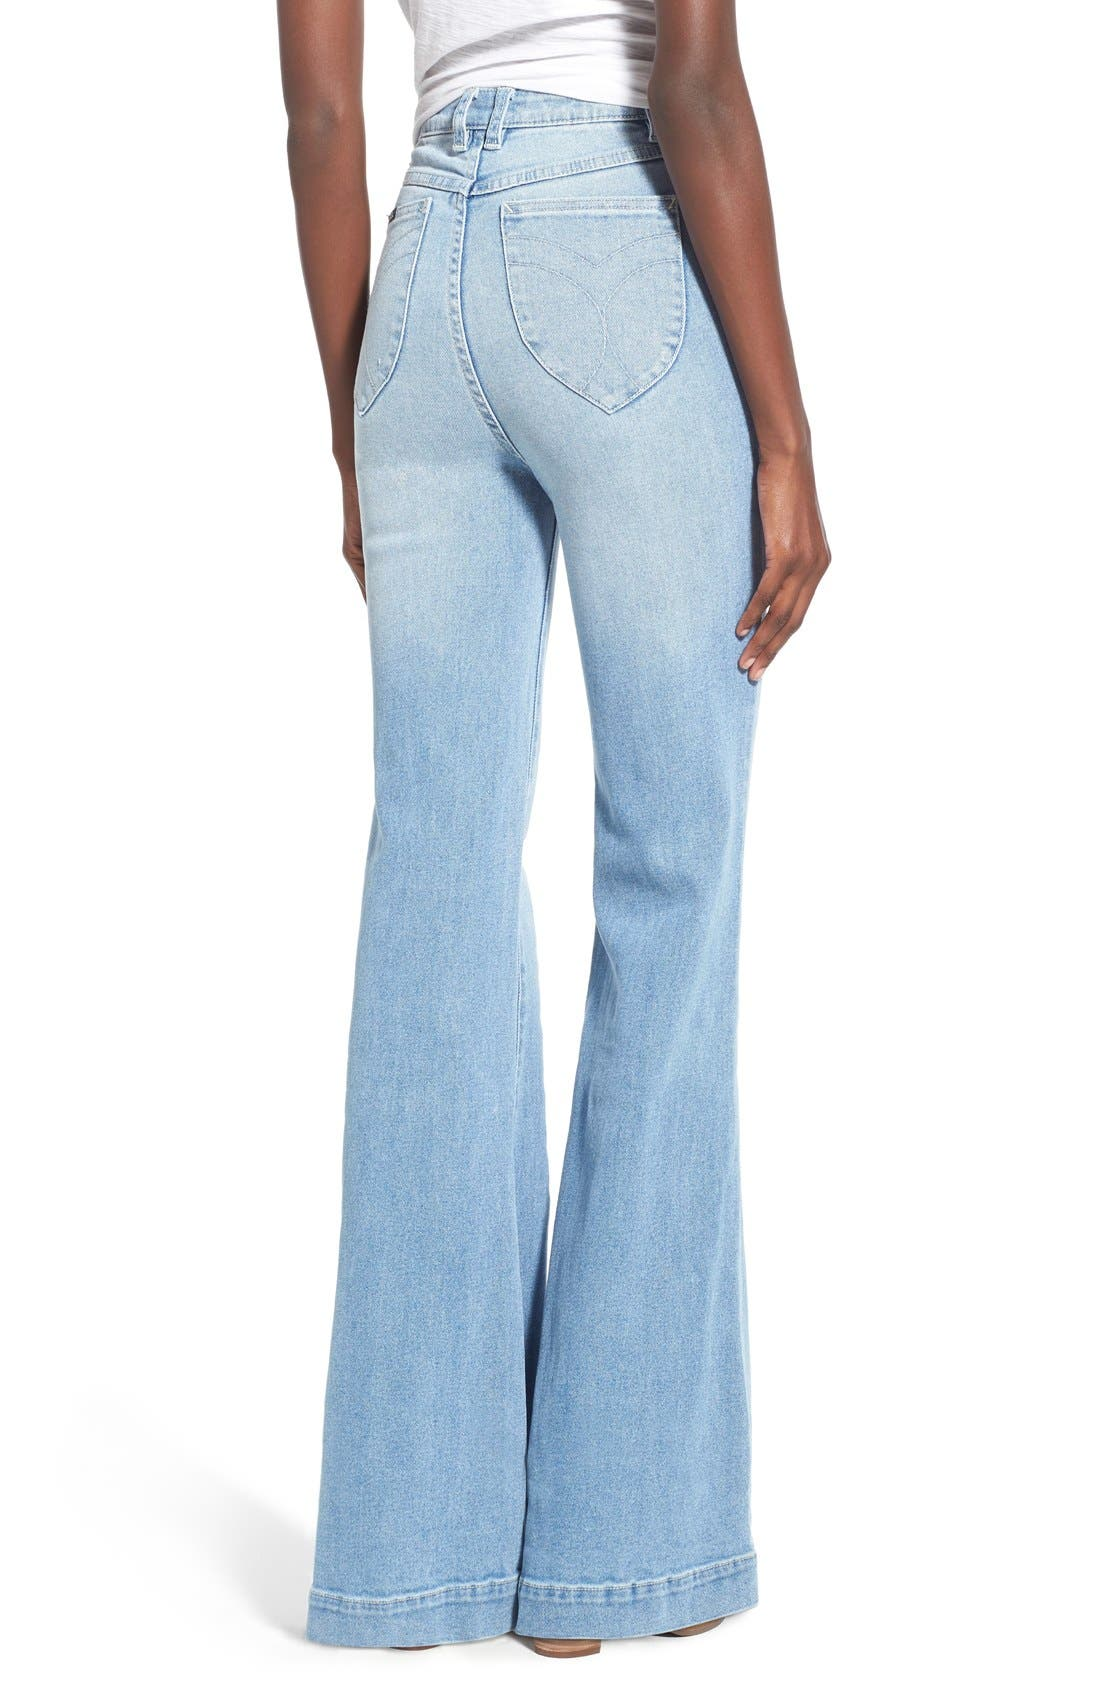 ROLLA'S,                             'East Coast' Flare Jeans,                             Alternate thumbnail 3, color,                             430